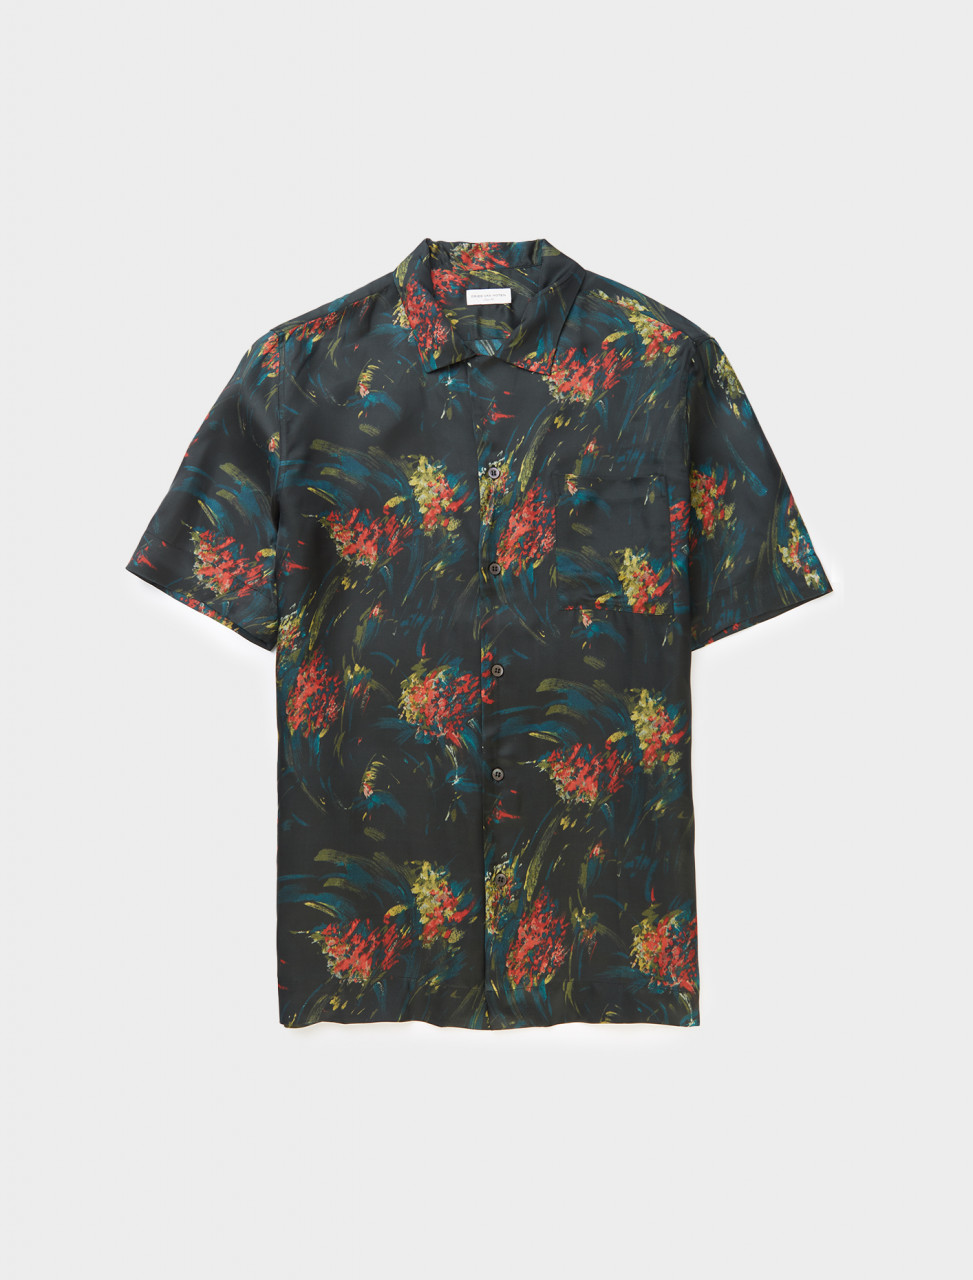 Dries van Noten Carltone Shirt in Black